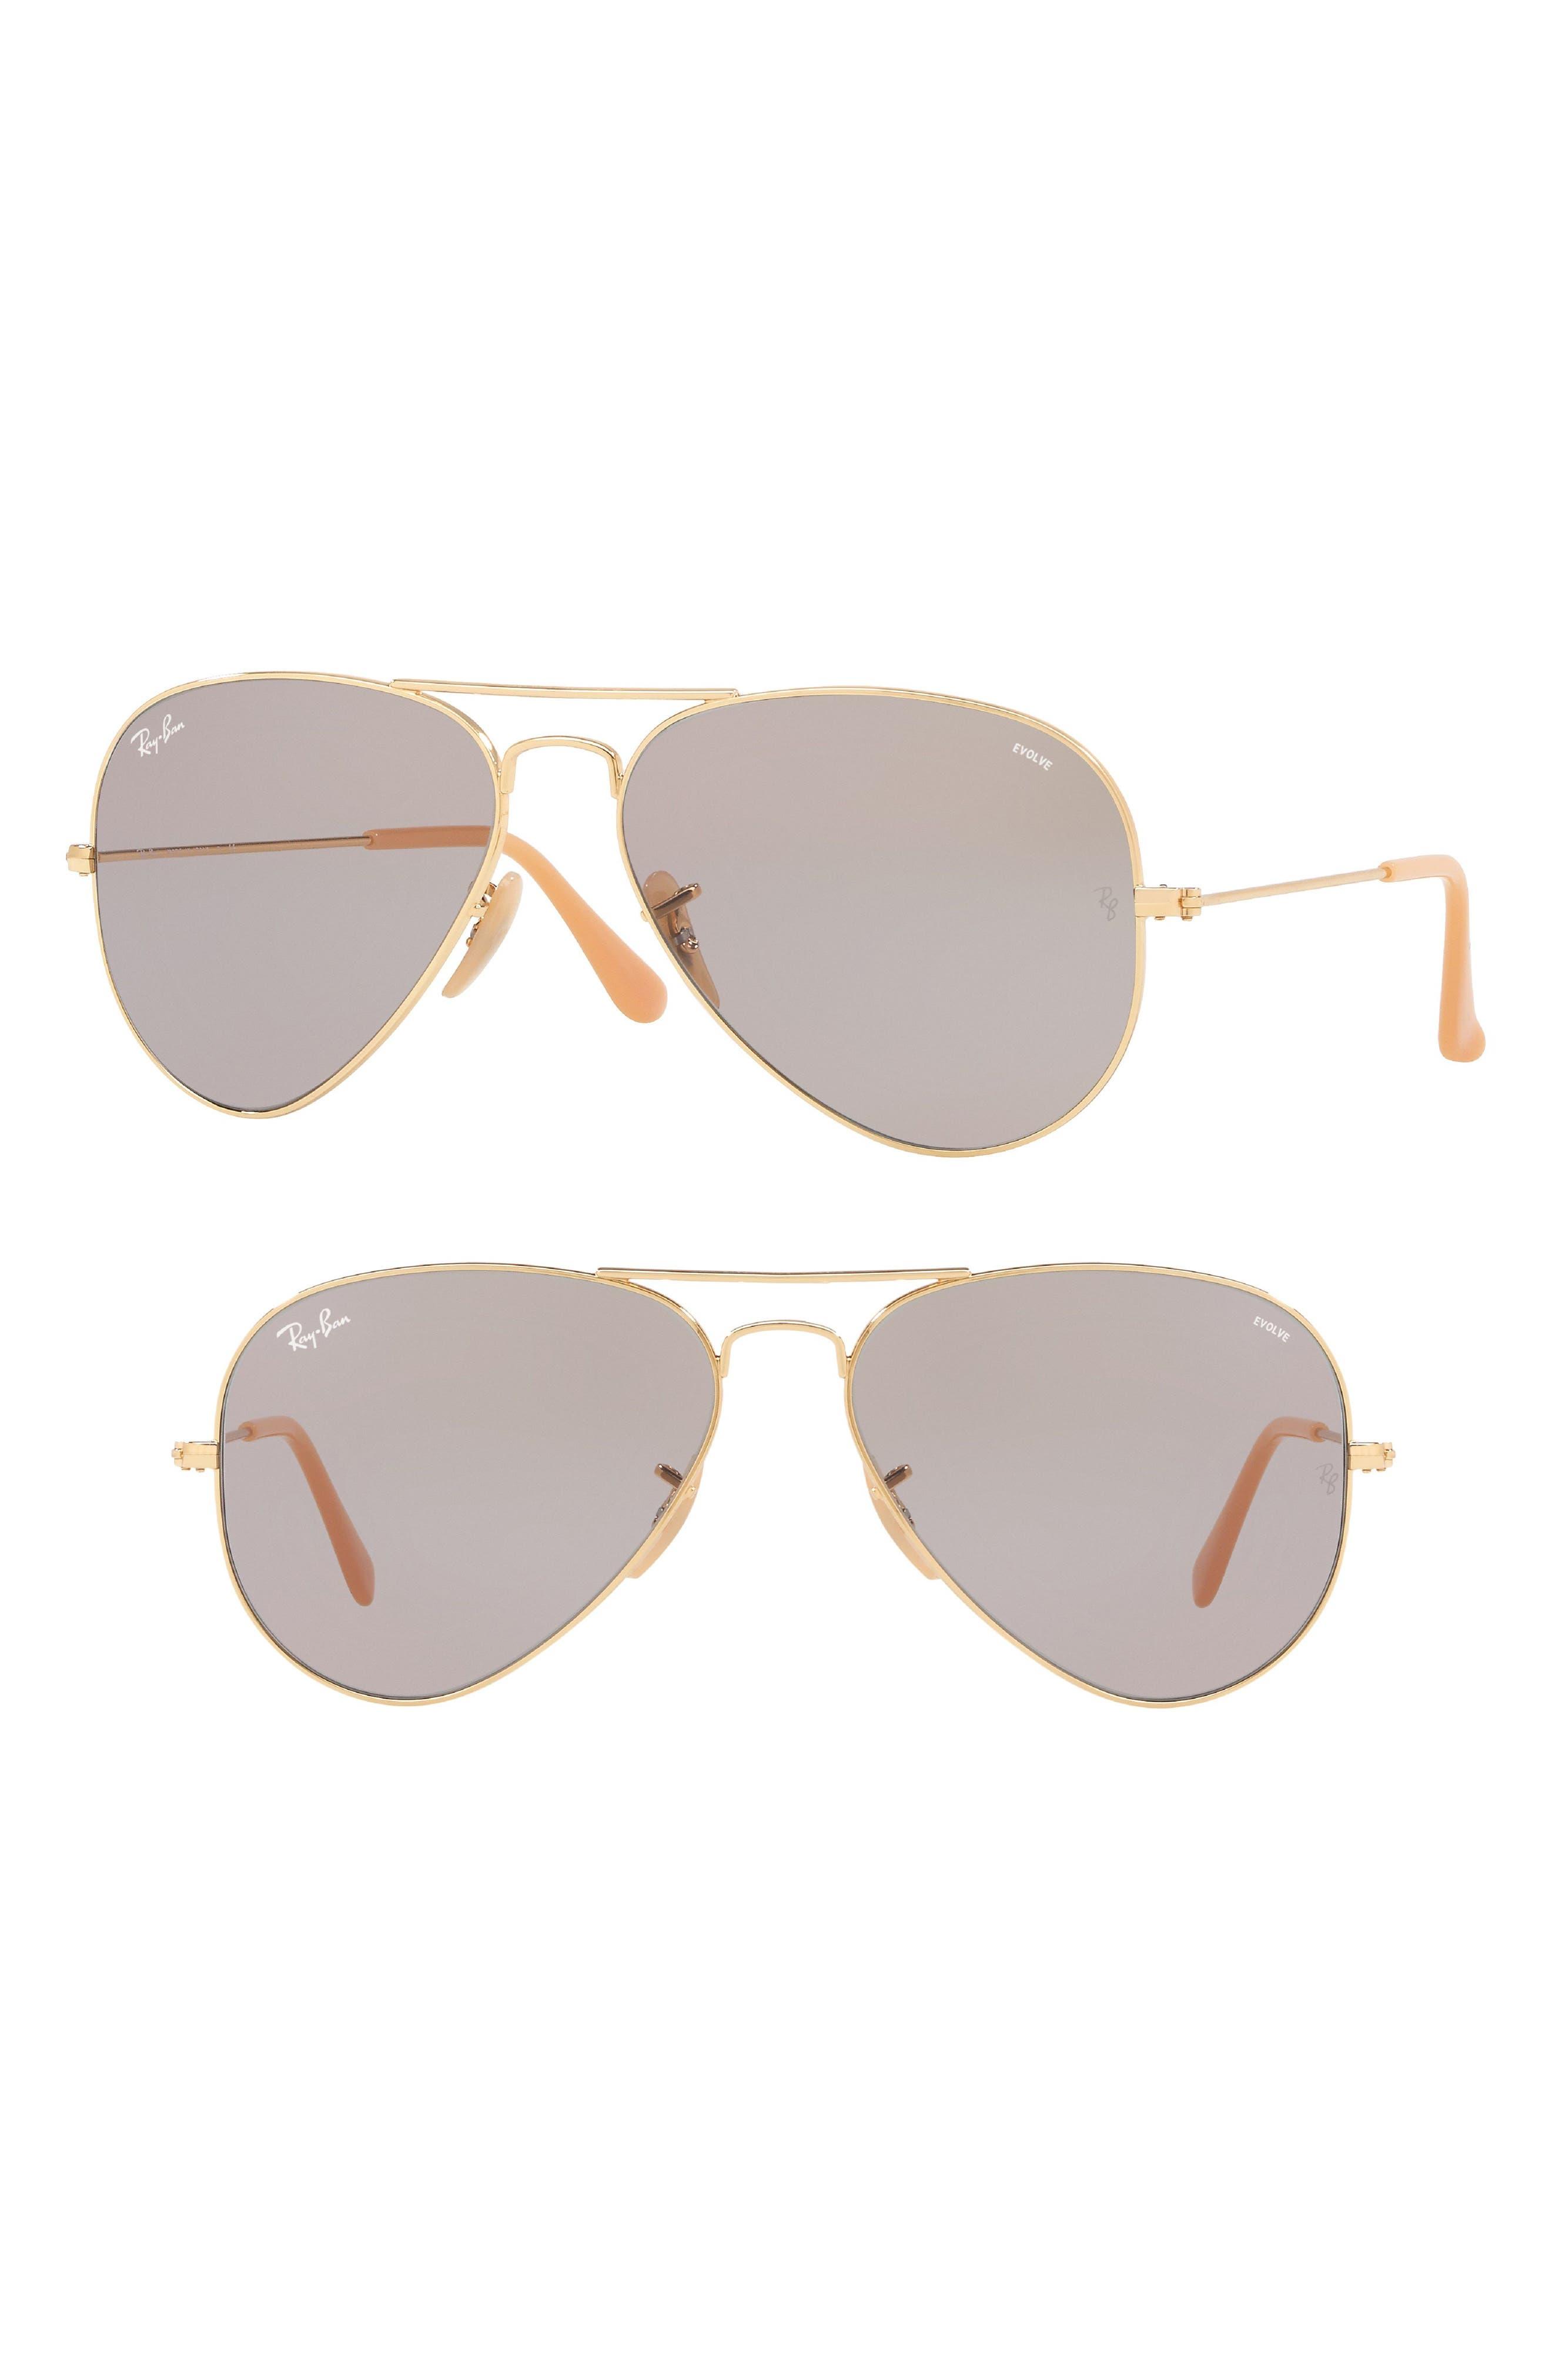 Ray-Ban 58mm Evolve Photochromic Aviator Sunglasses